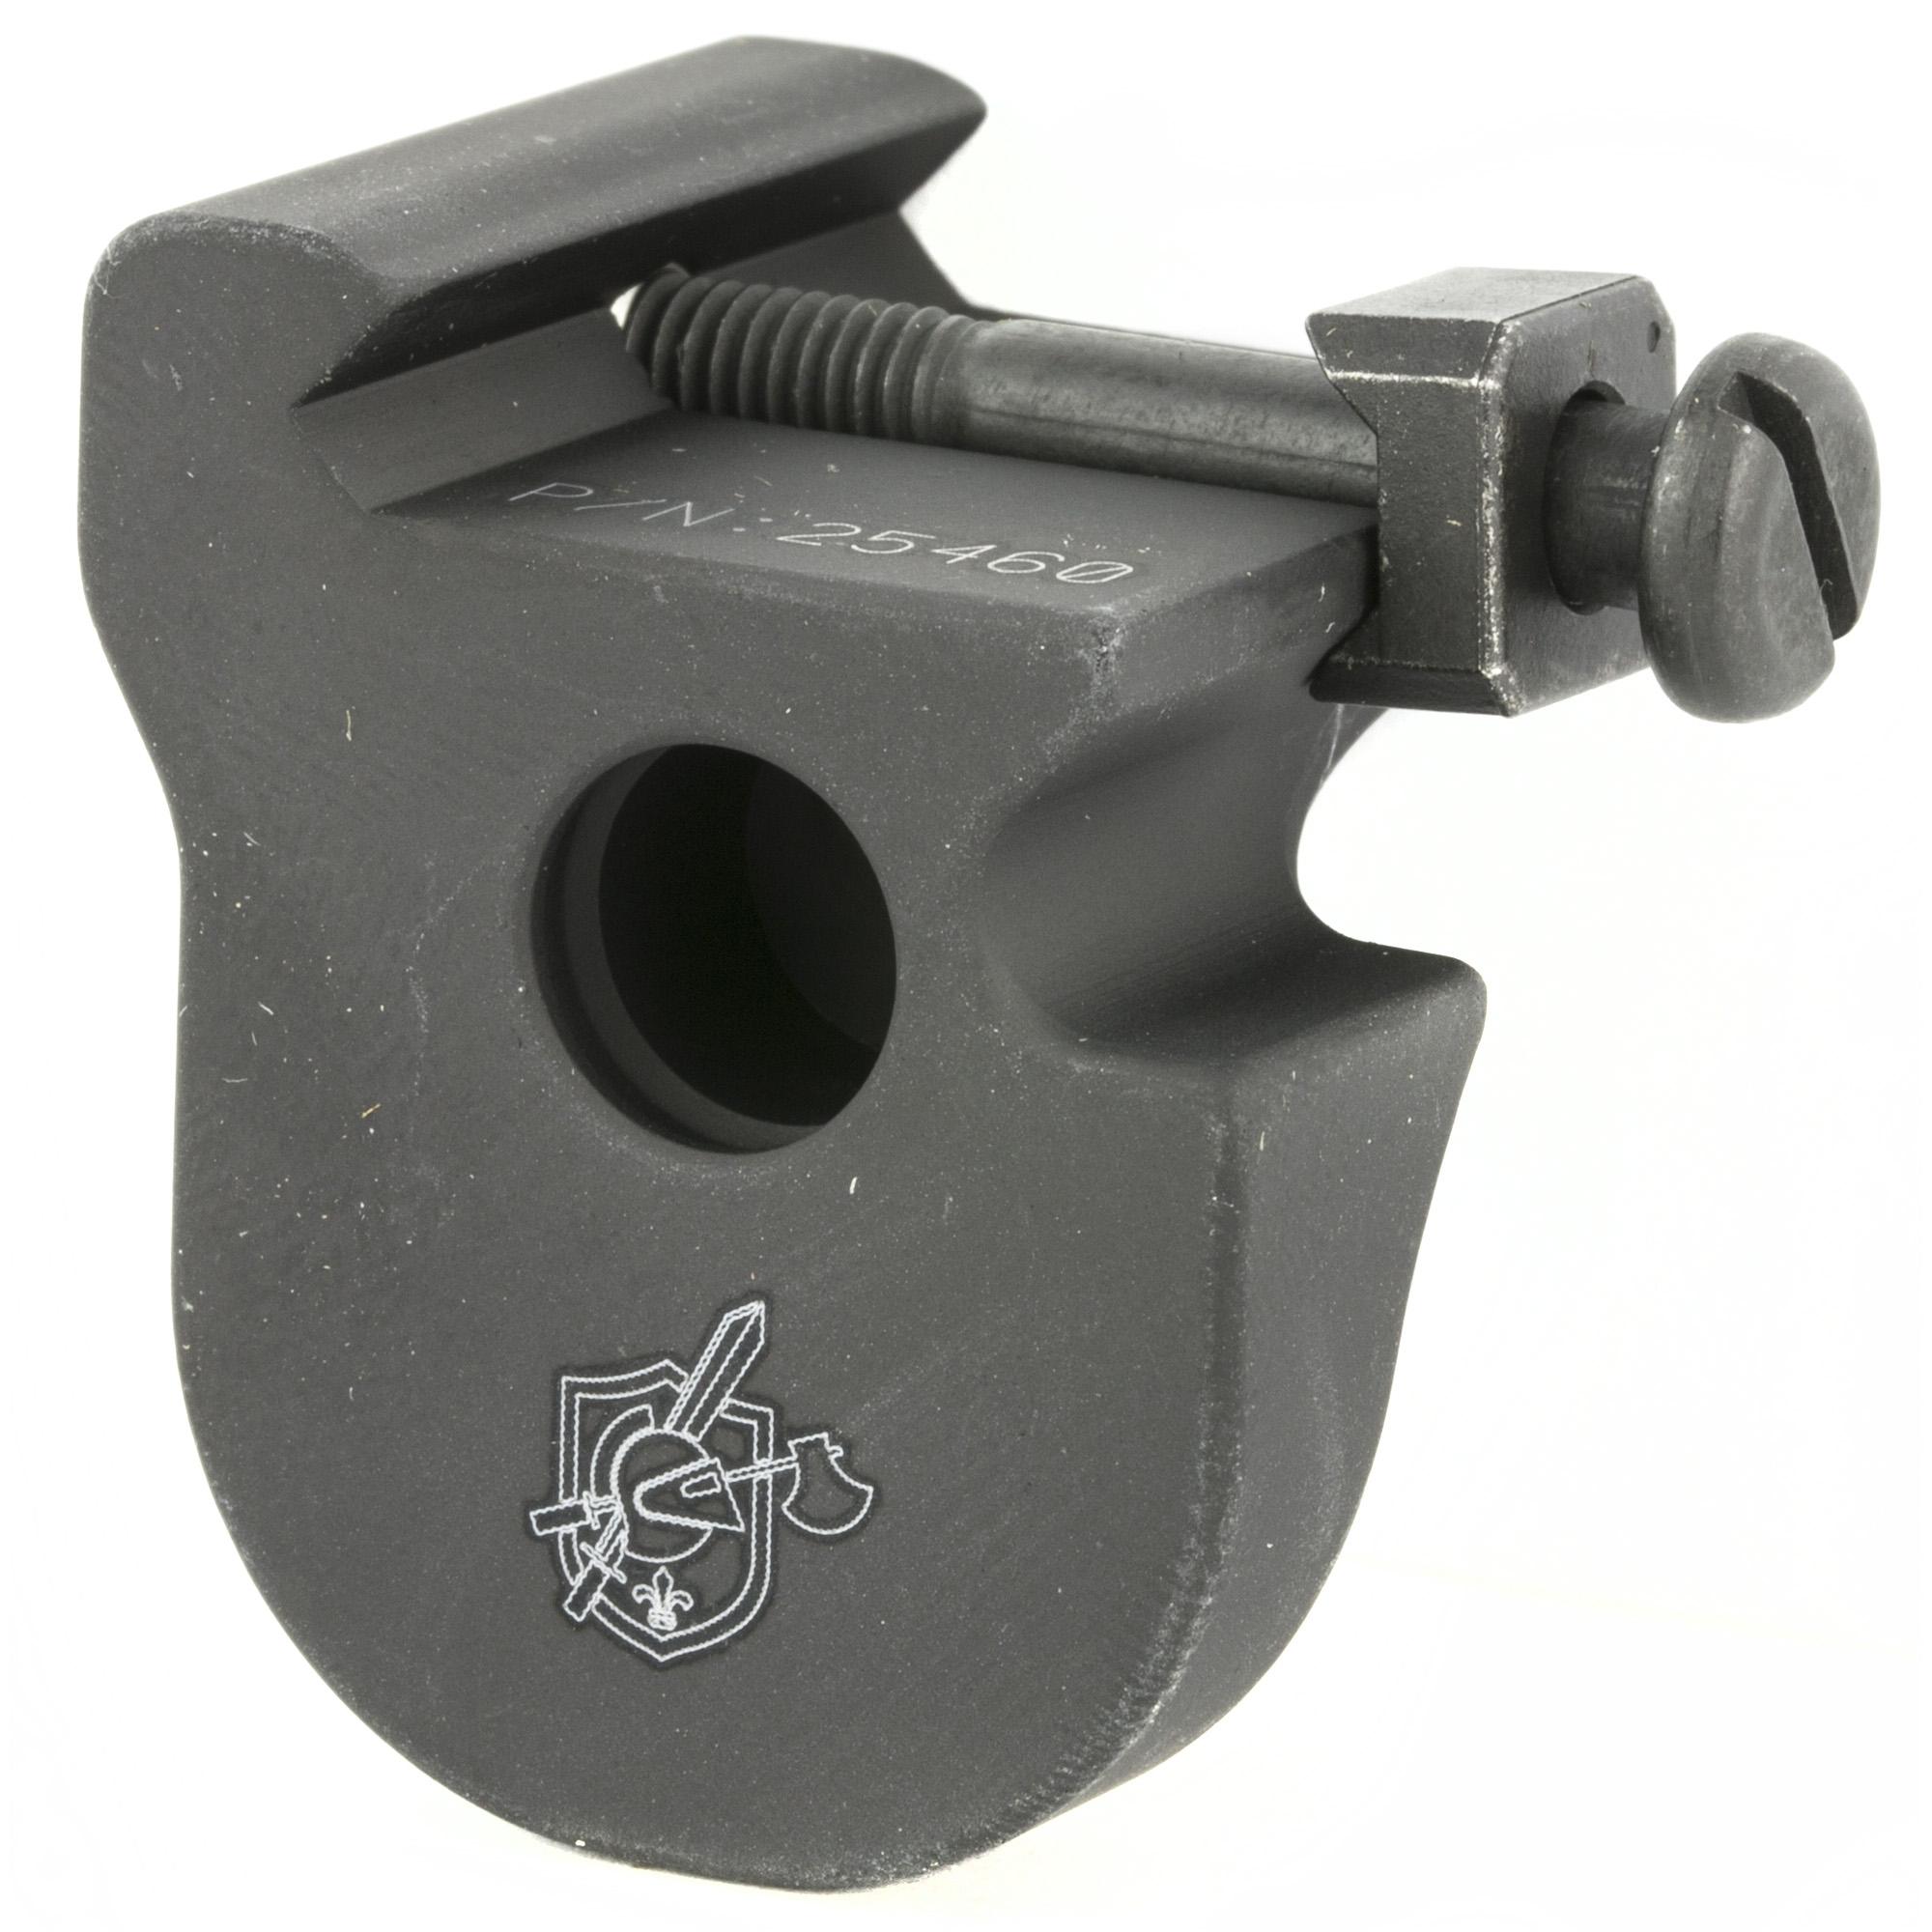 Kac Forward Hand Stop W/qd Socket